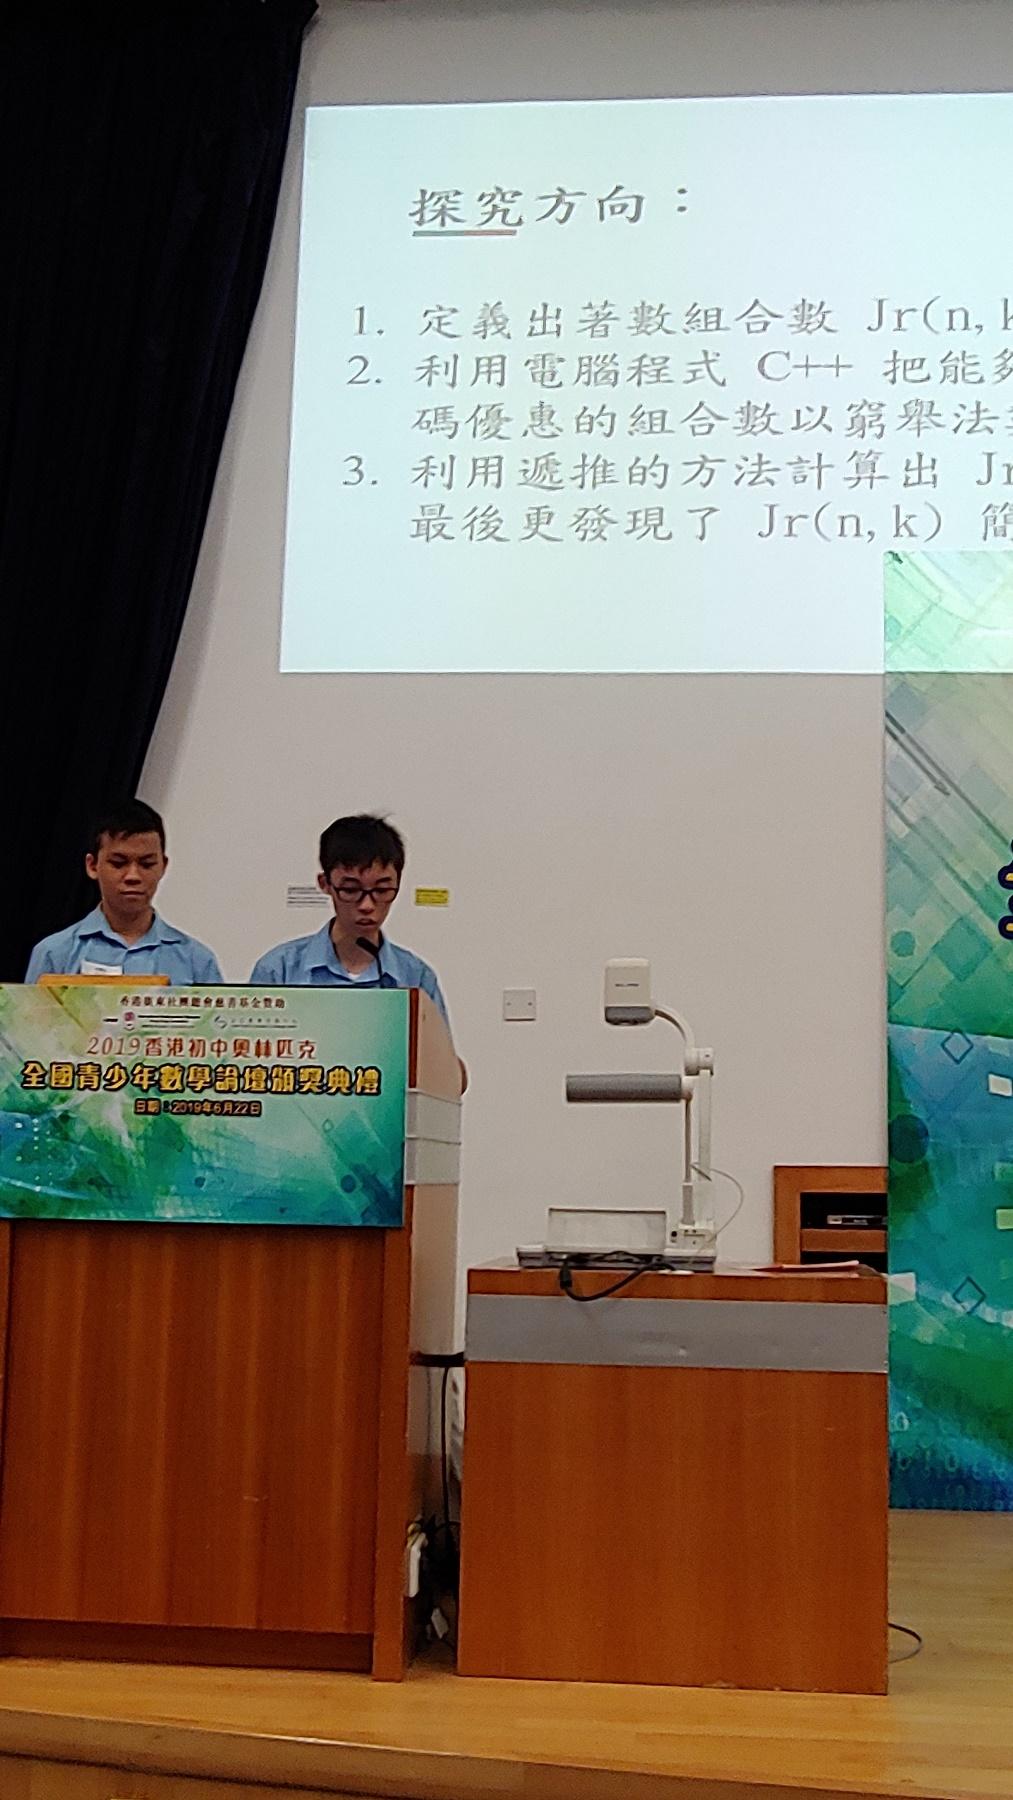 http://npc.edu.hk/sites/default/files/20190622_115731.jpg